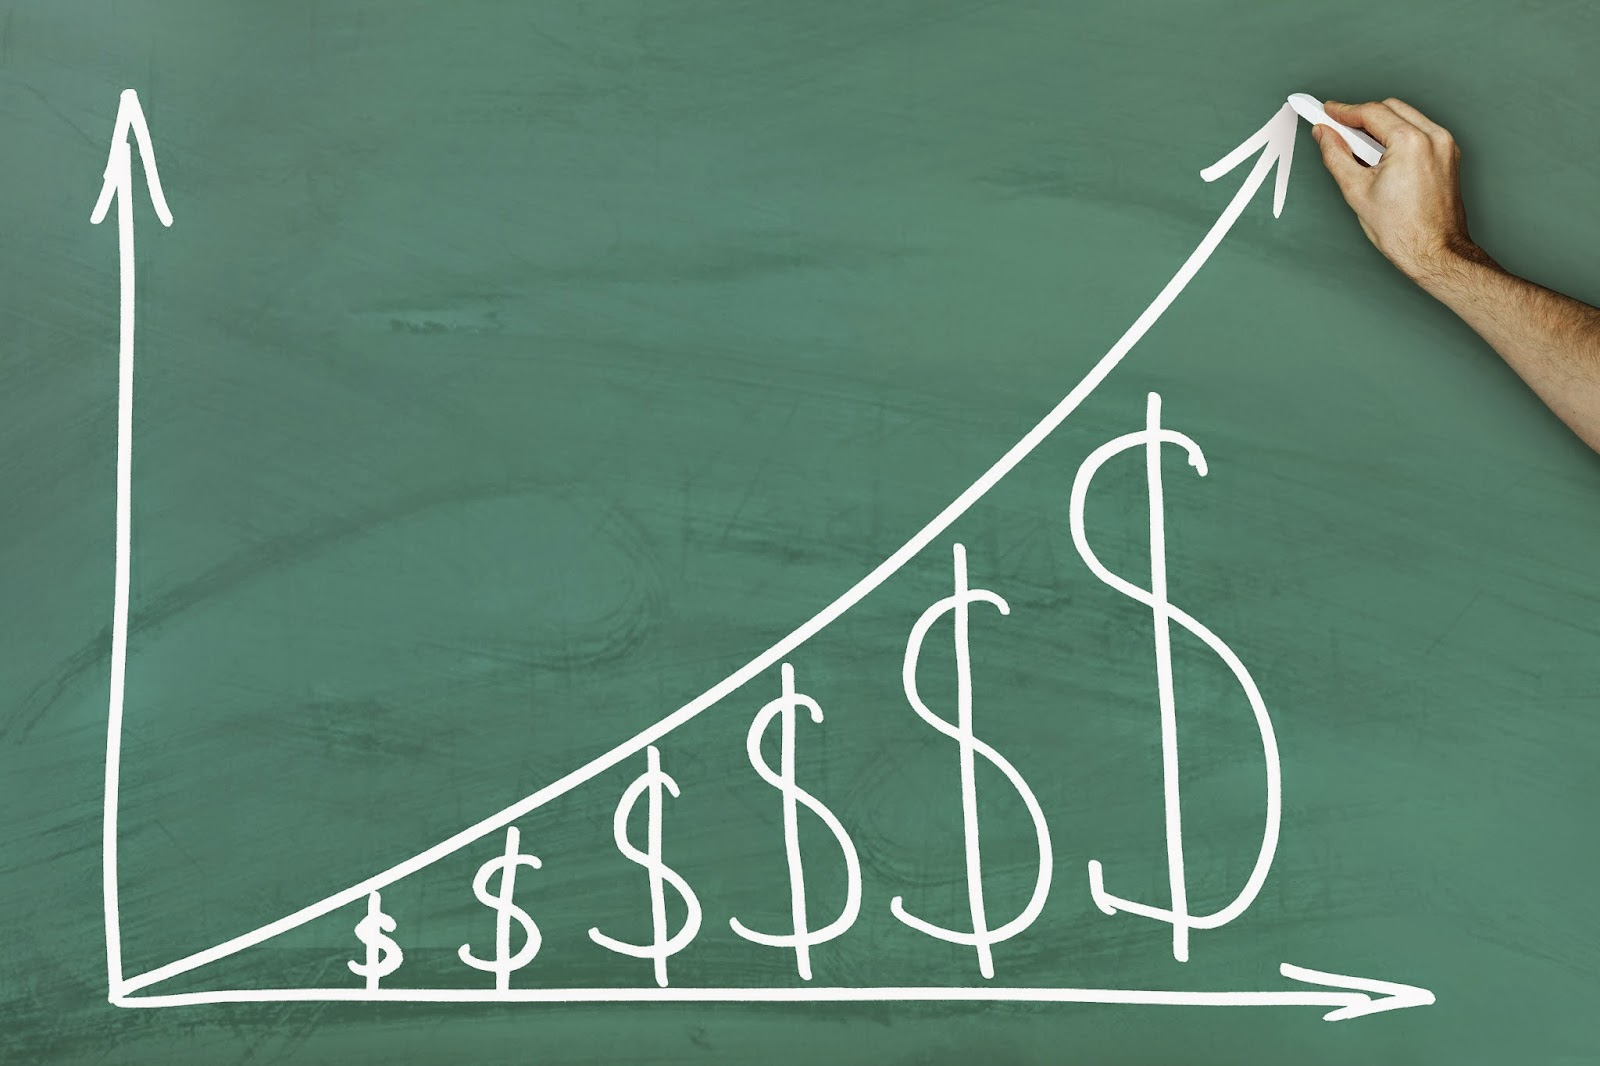 Chalkboard showing monetary growth chart